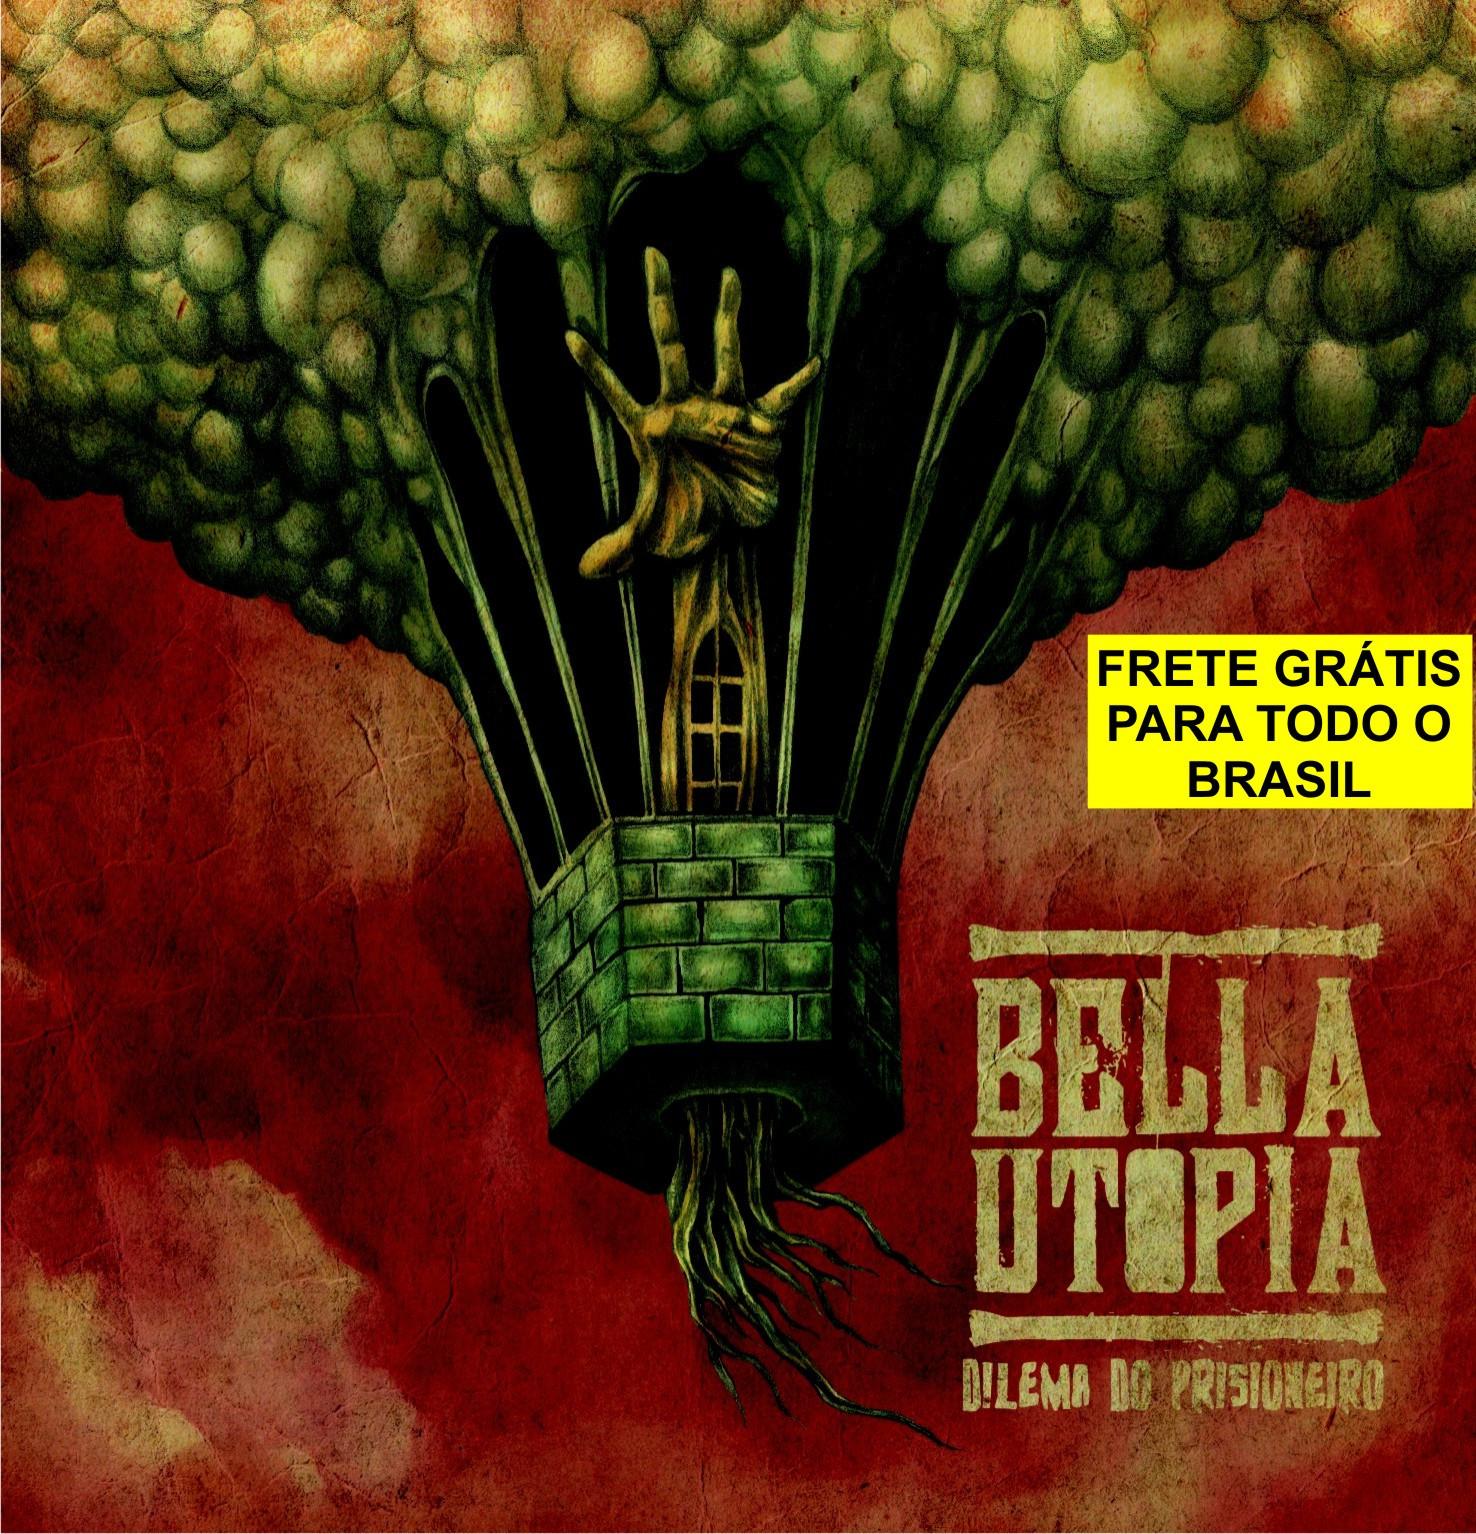 BELLA UTOPIA - Dilema do Prisioneiro (CD) - FRETE GRÁTIS